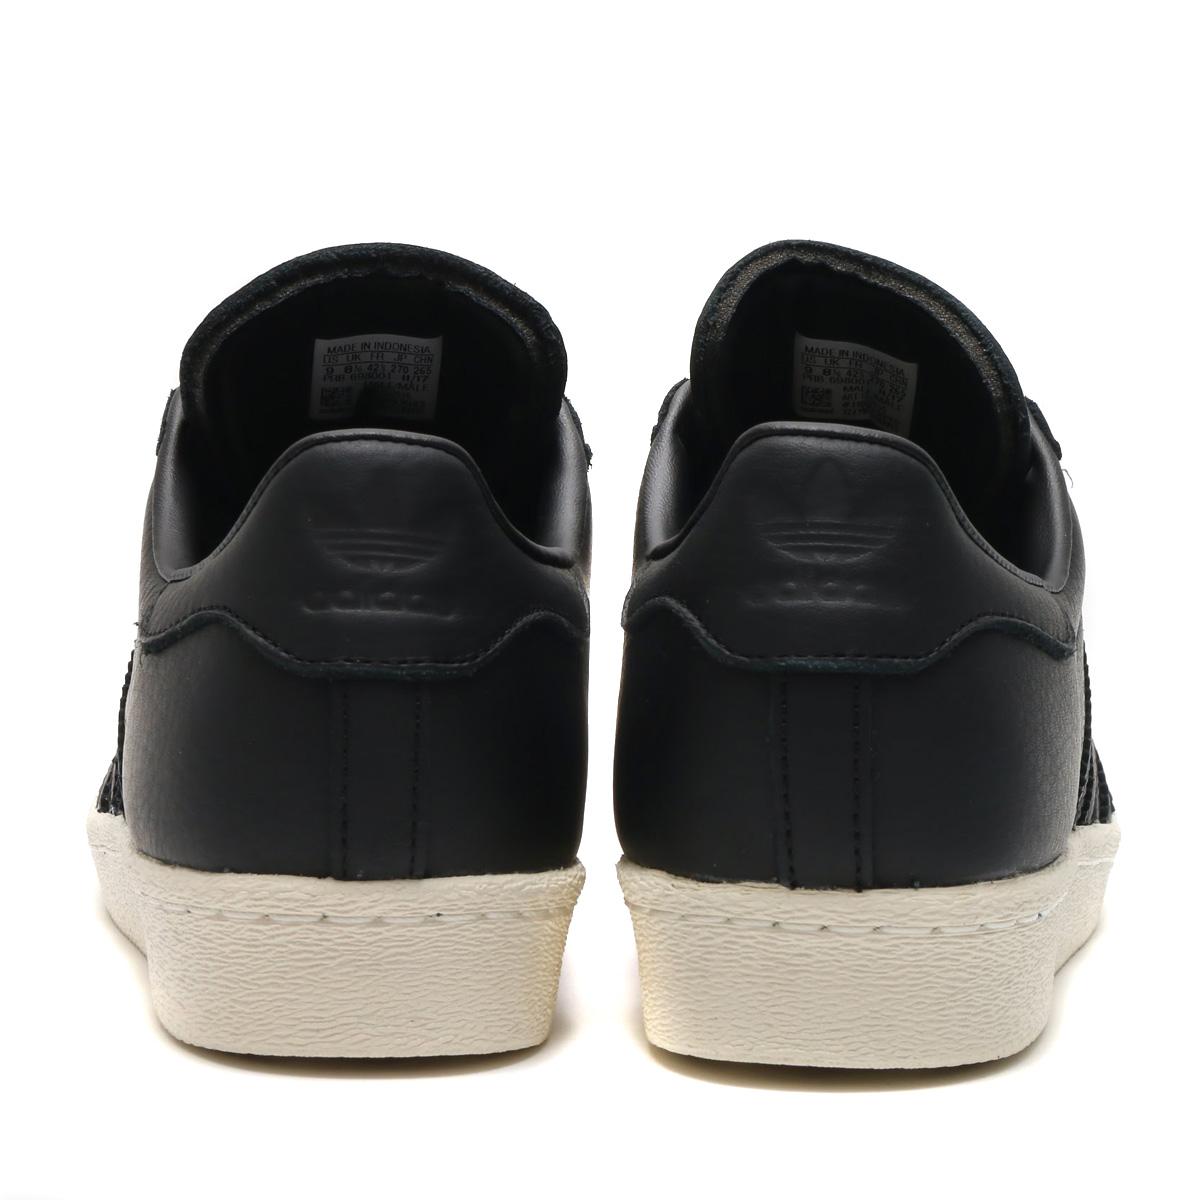 adidas Originals SUPERSTAR 80s (Adidas originals superstar 80s) Core BlackGreenRed 18SS S